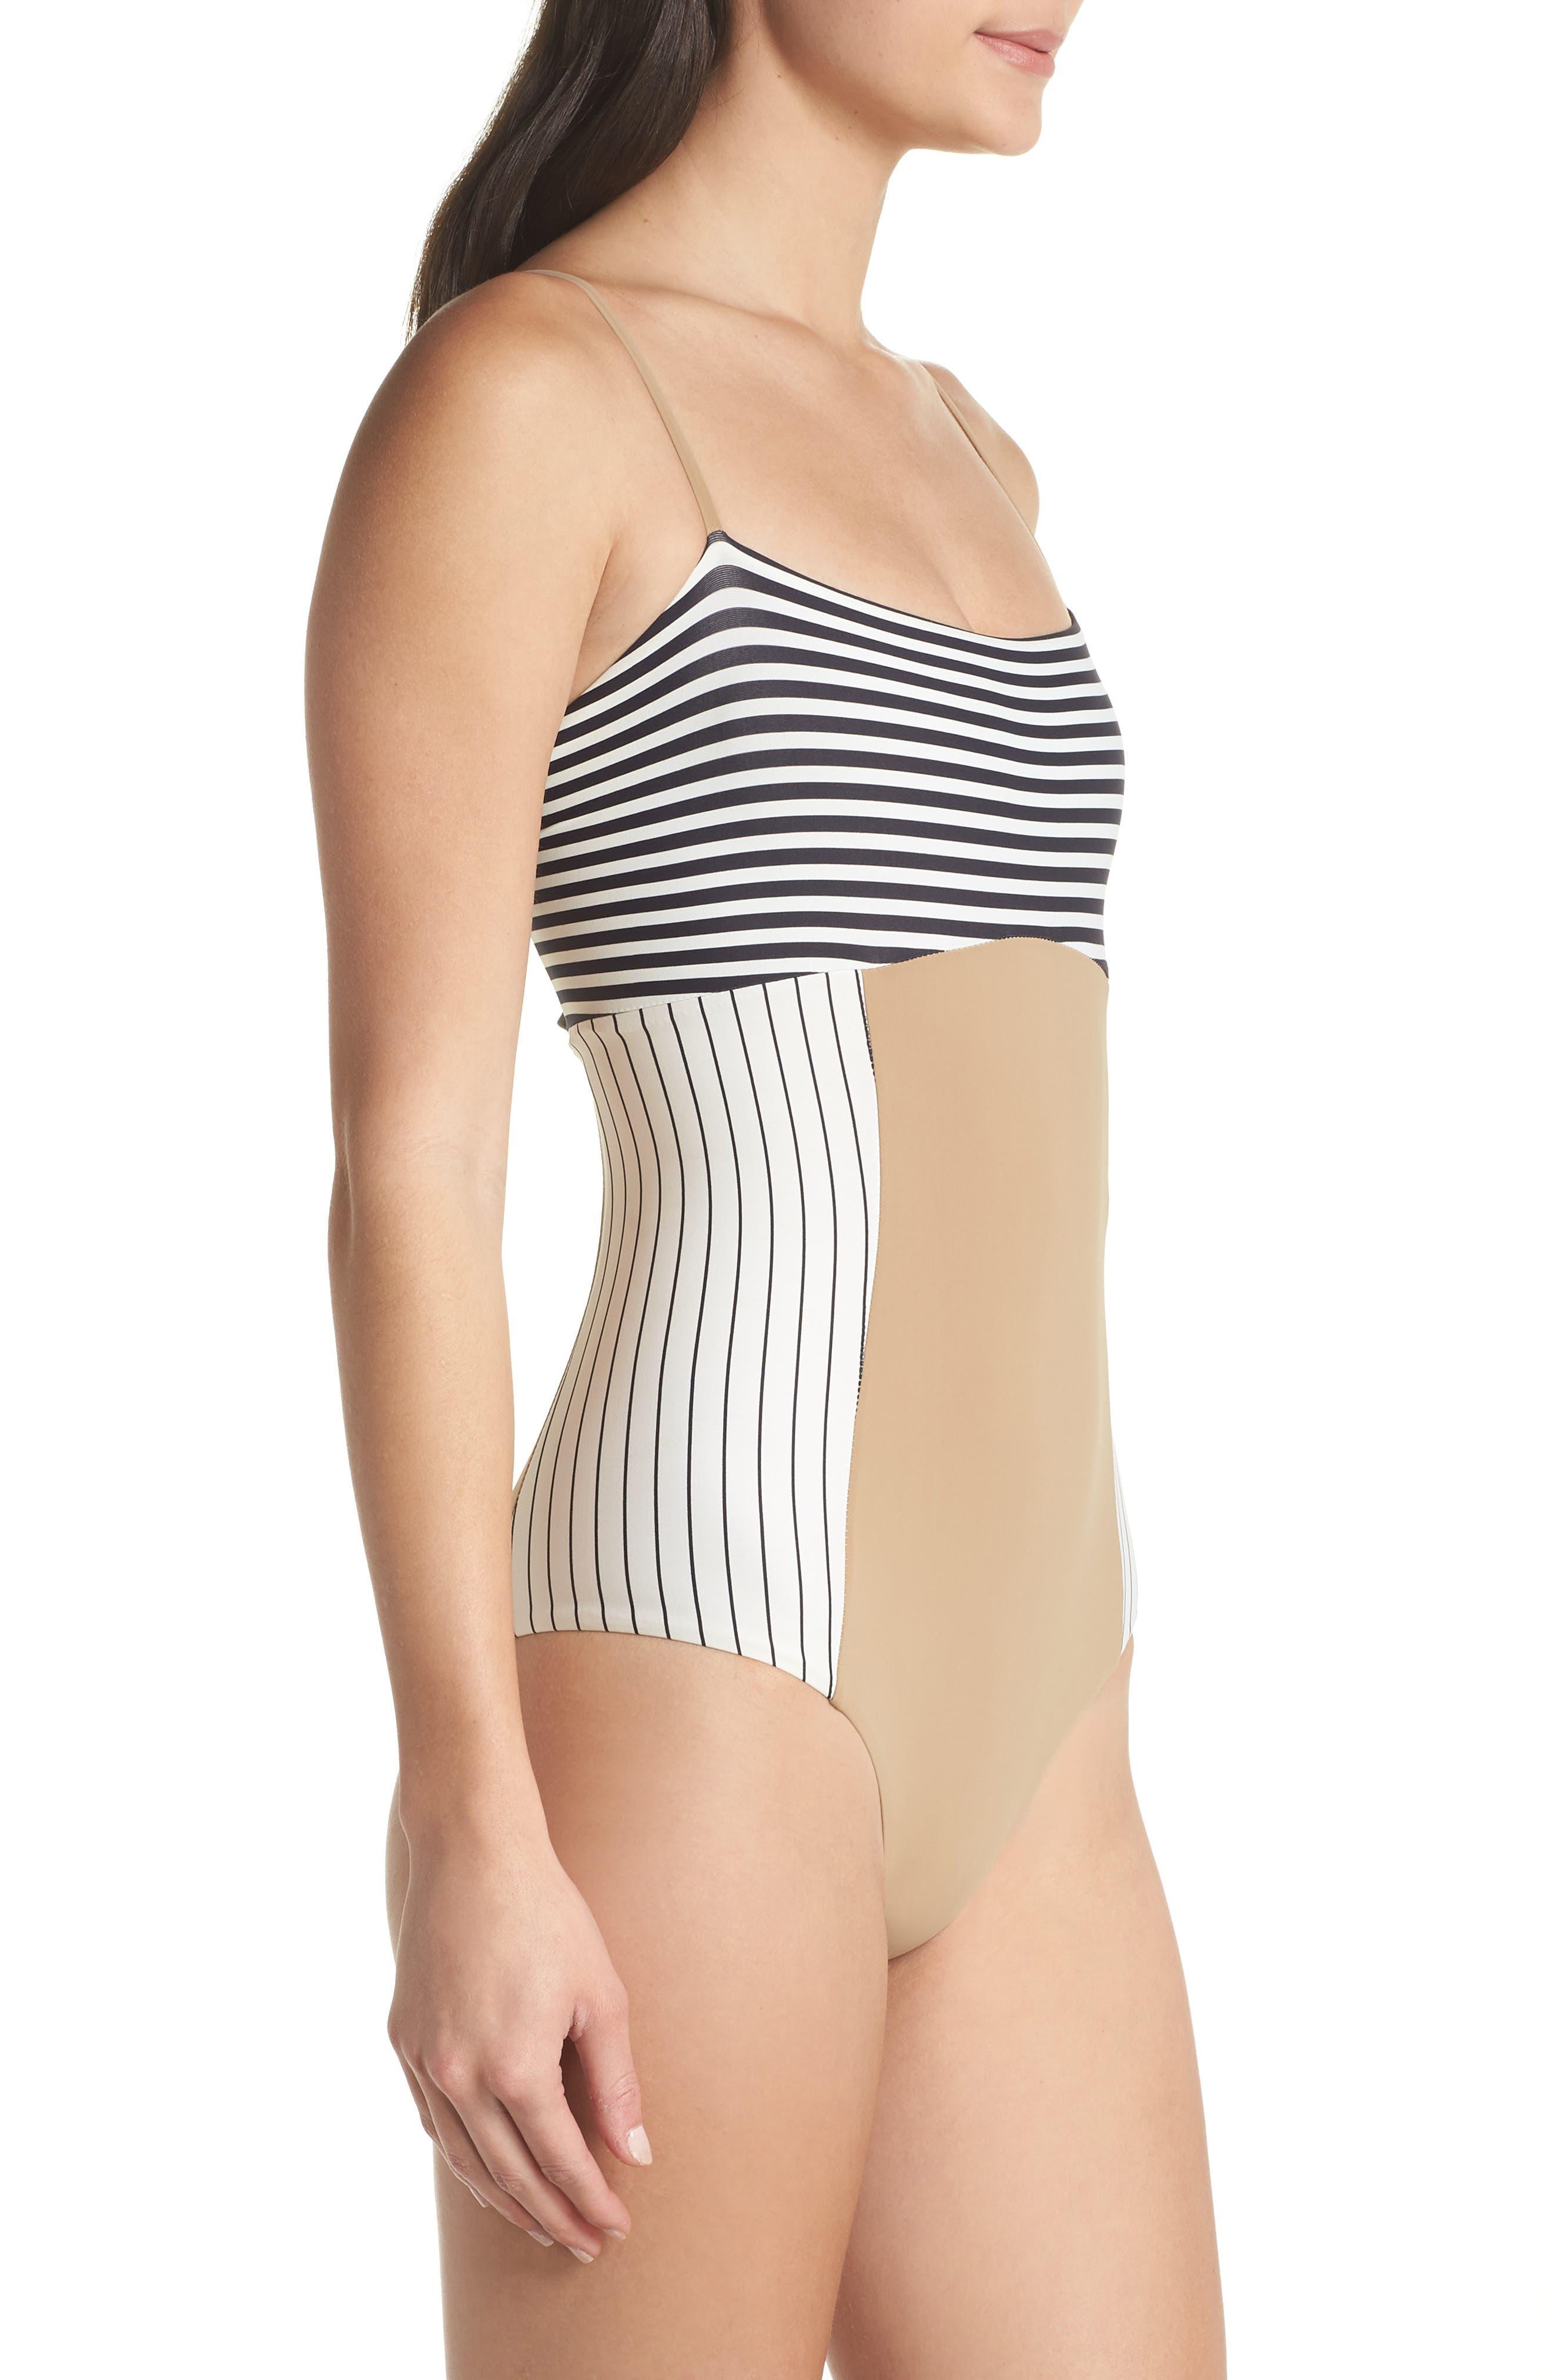 Finn One-Piece Swimsuit,                             Alternate thumbnail 3, color,                             250